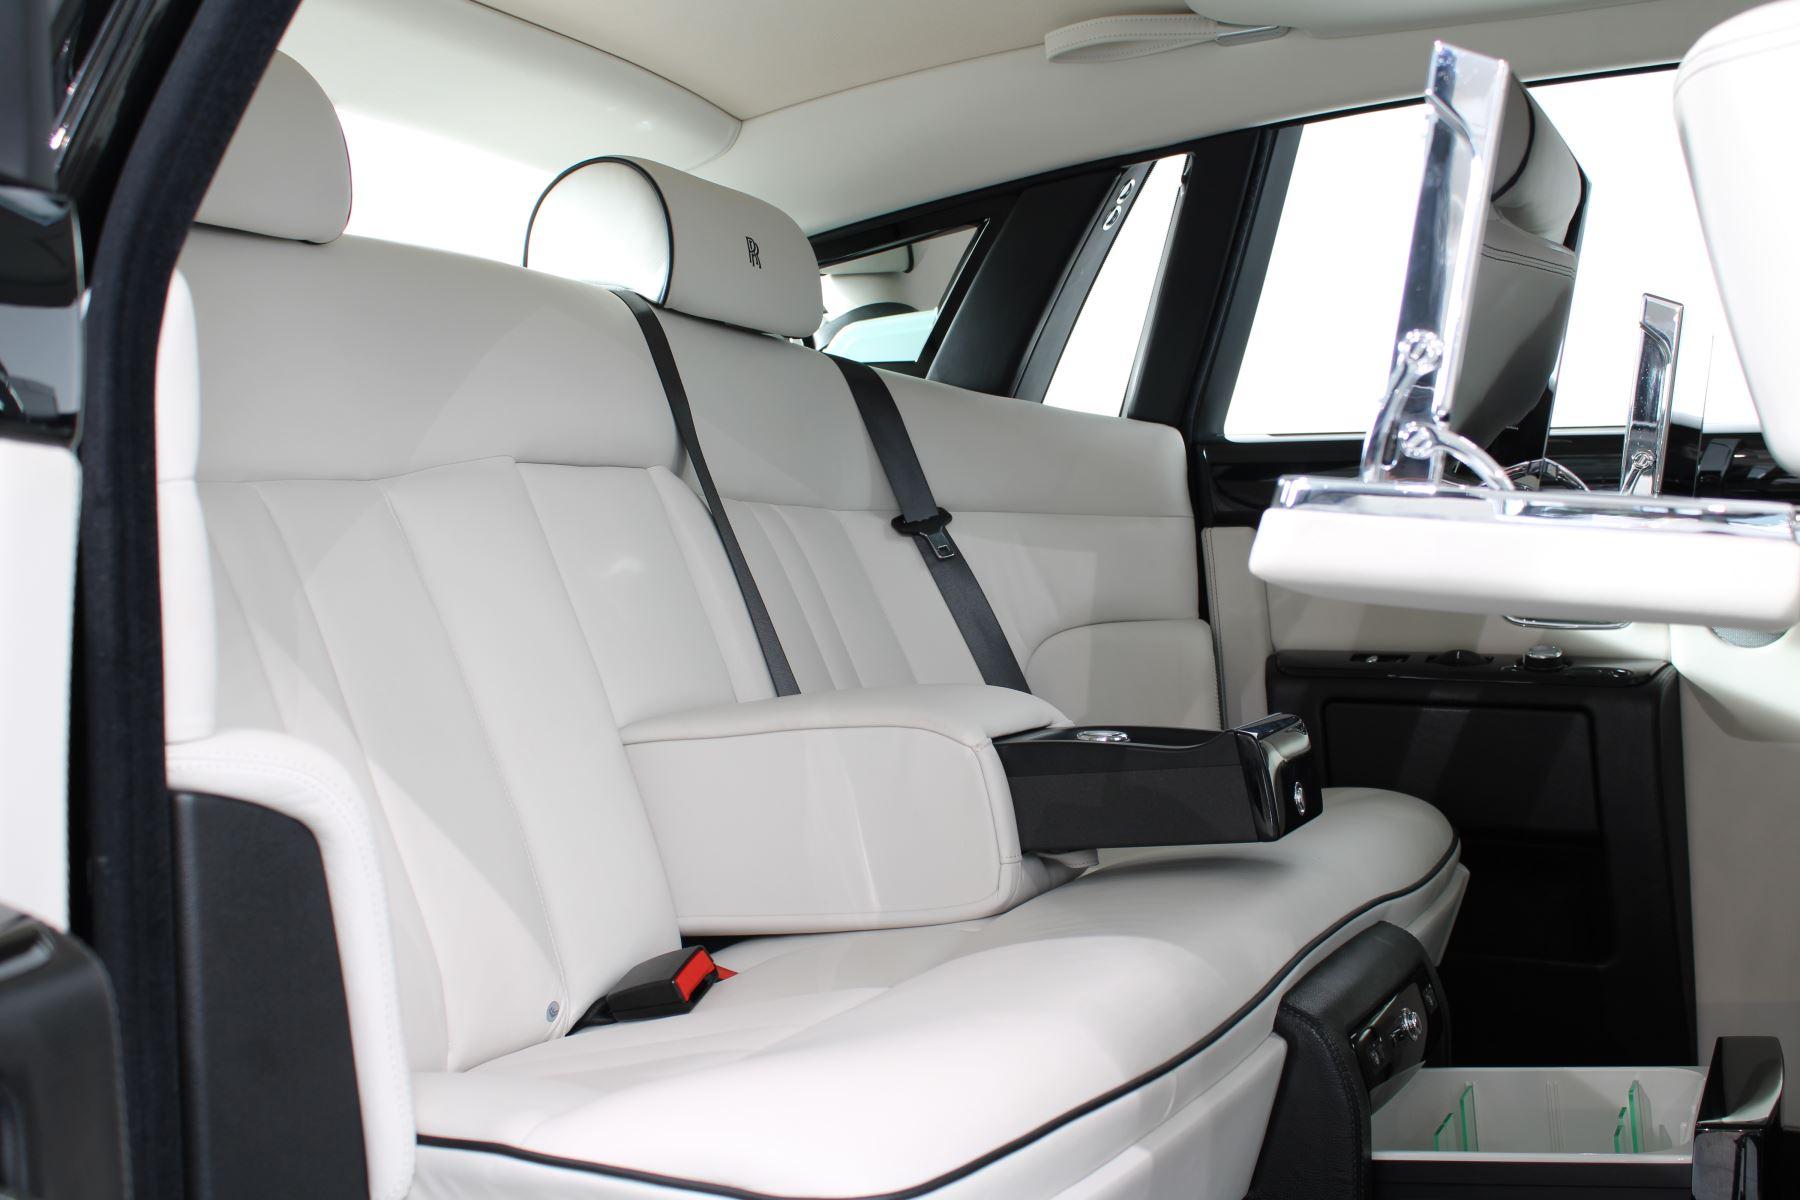 Rolls-Royce Phantom II 4dr Auto image 38